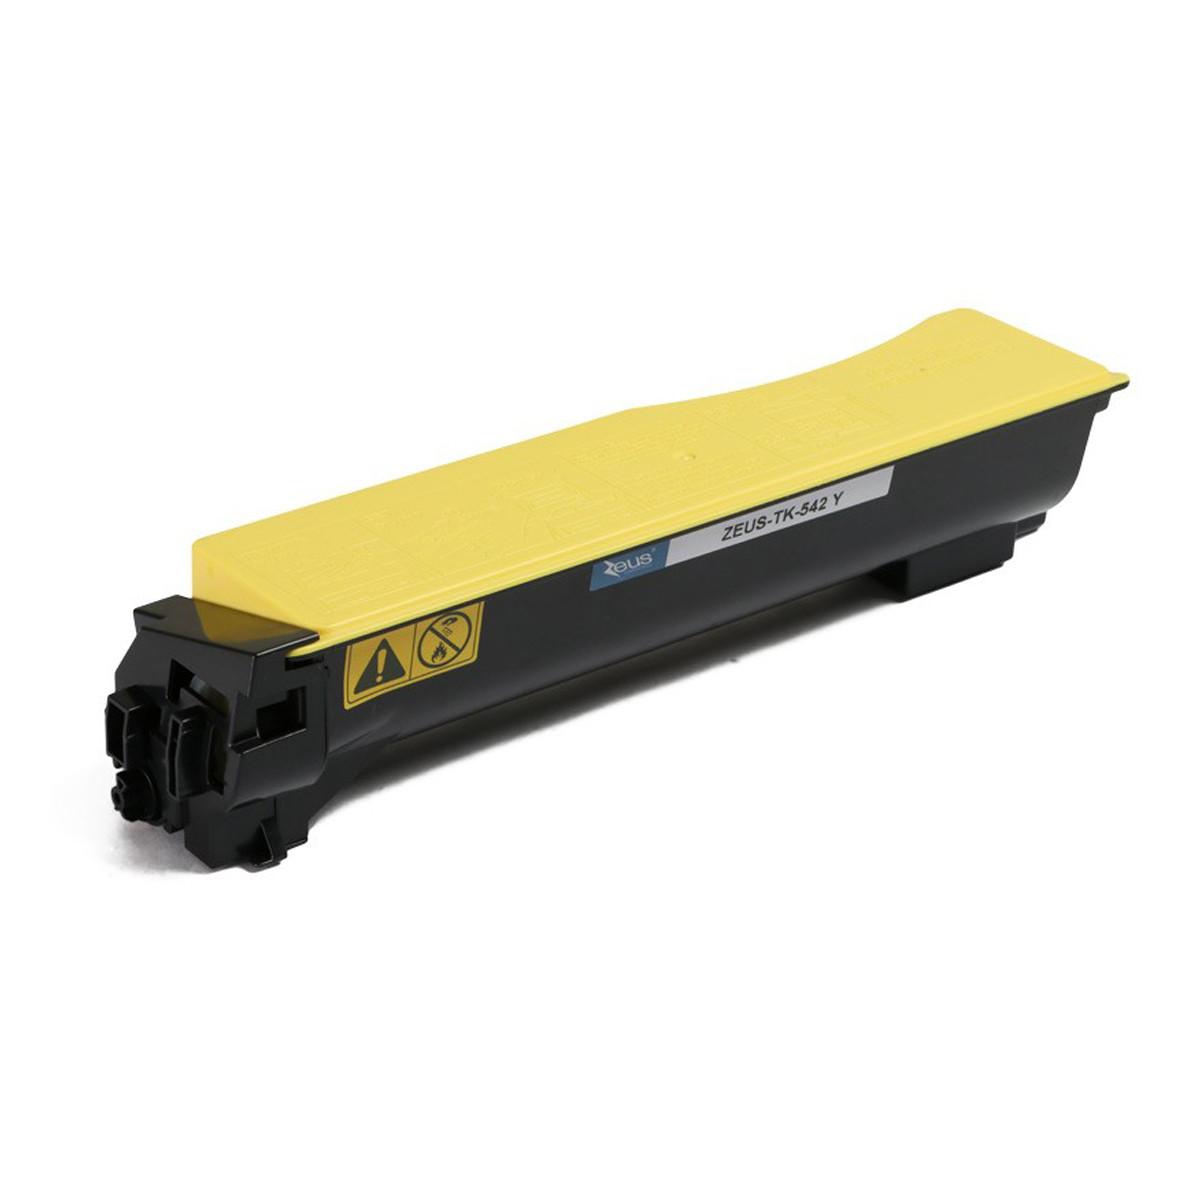 Toner Compatível com Kyocera TK542 TK542Y Amarelo | FS-C5100DN FSC5100 C5100DN | Zeus 4k